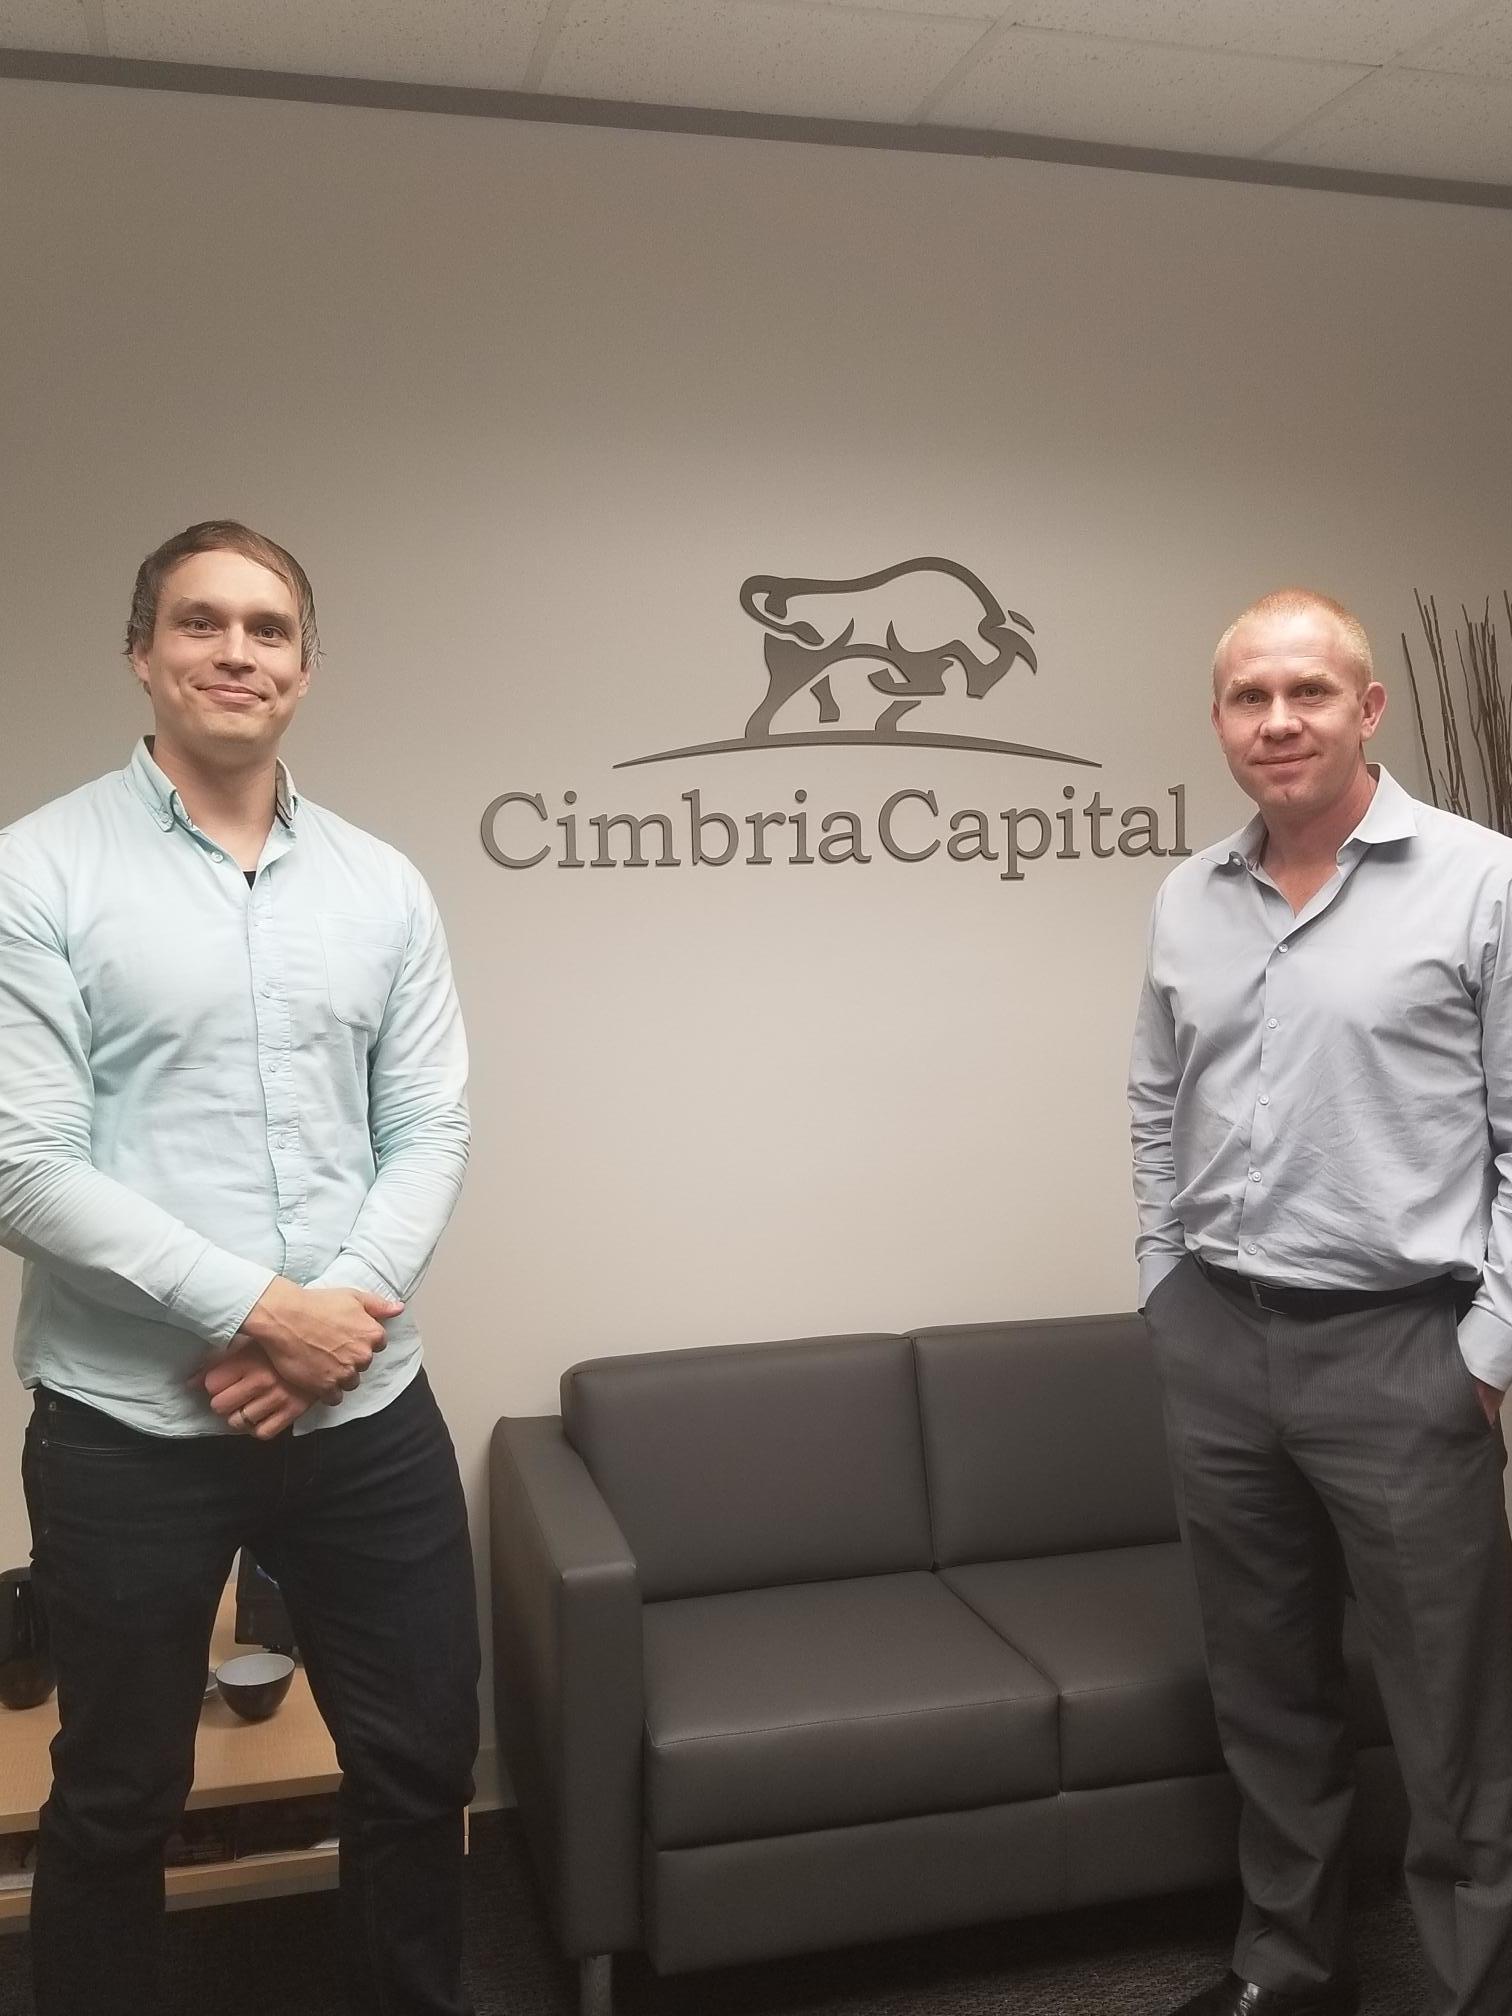 Brian Iversen of Cimbria Capital & Ville